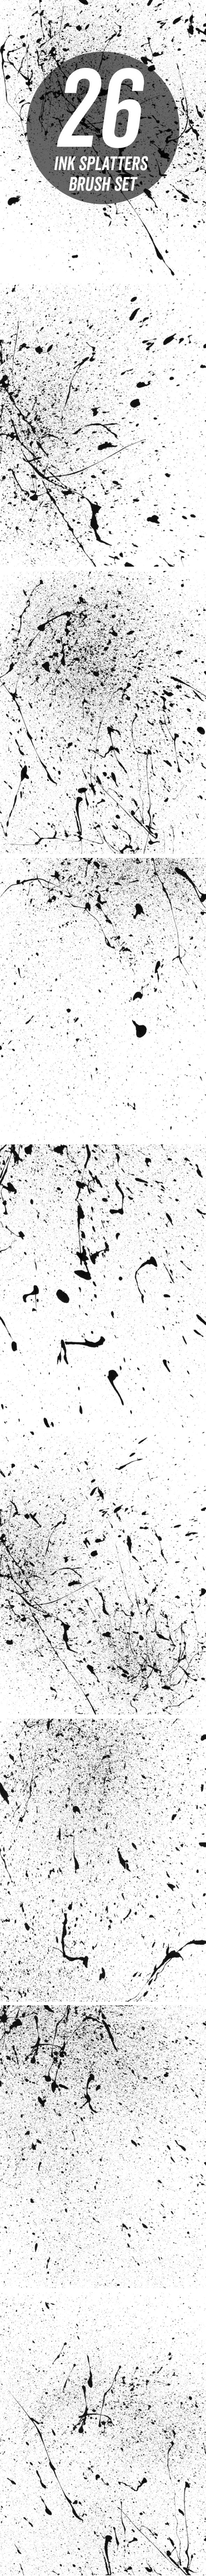 ink-splatters